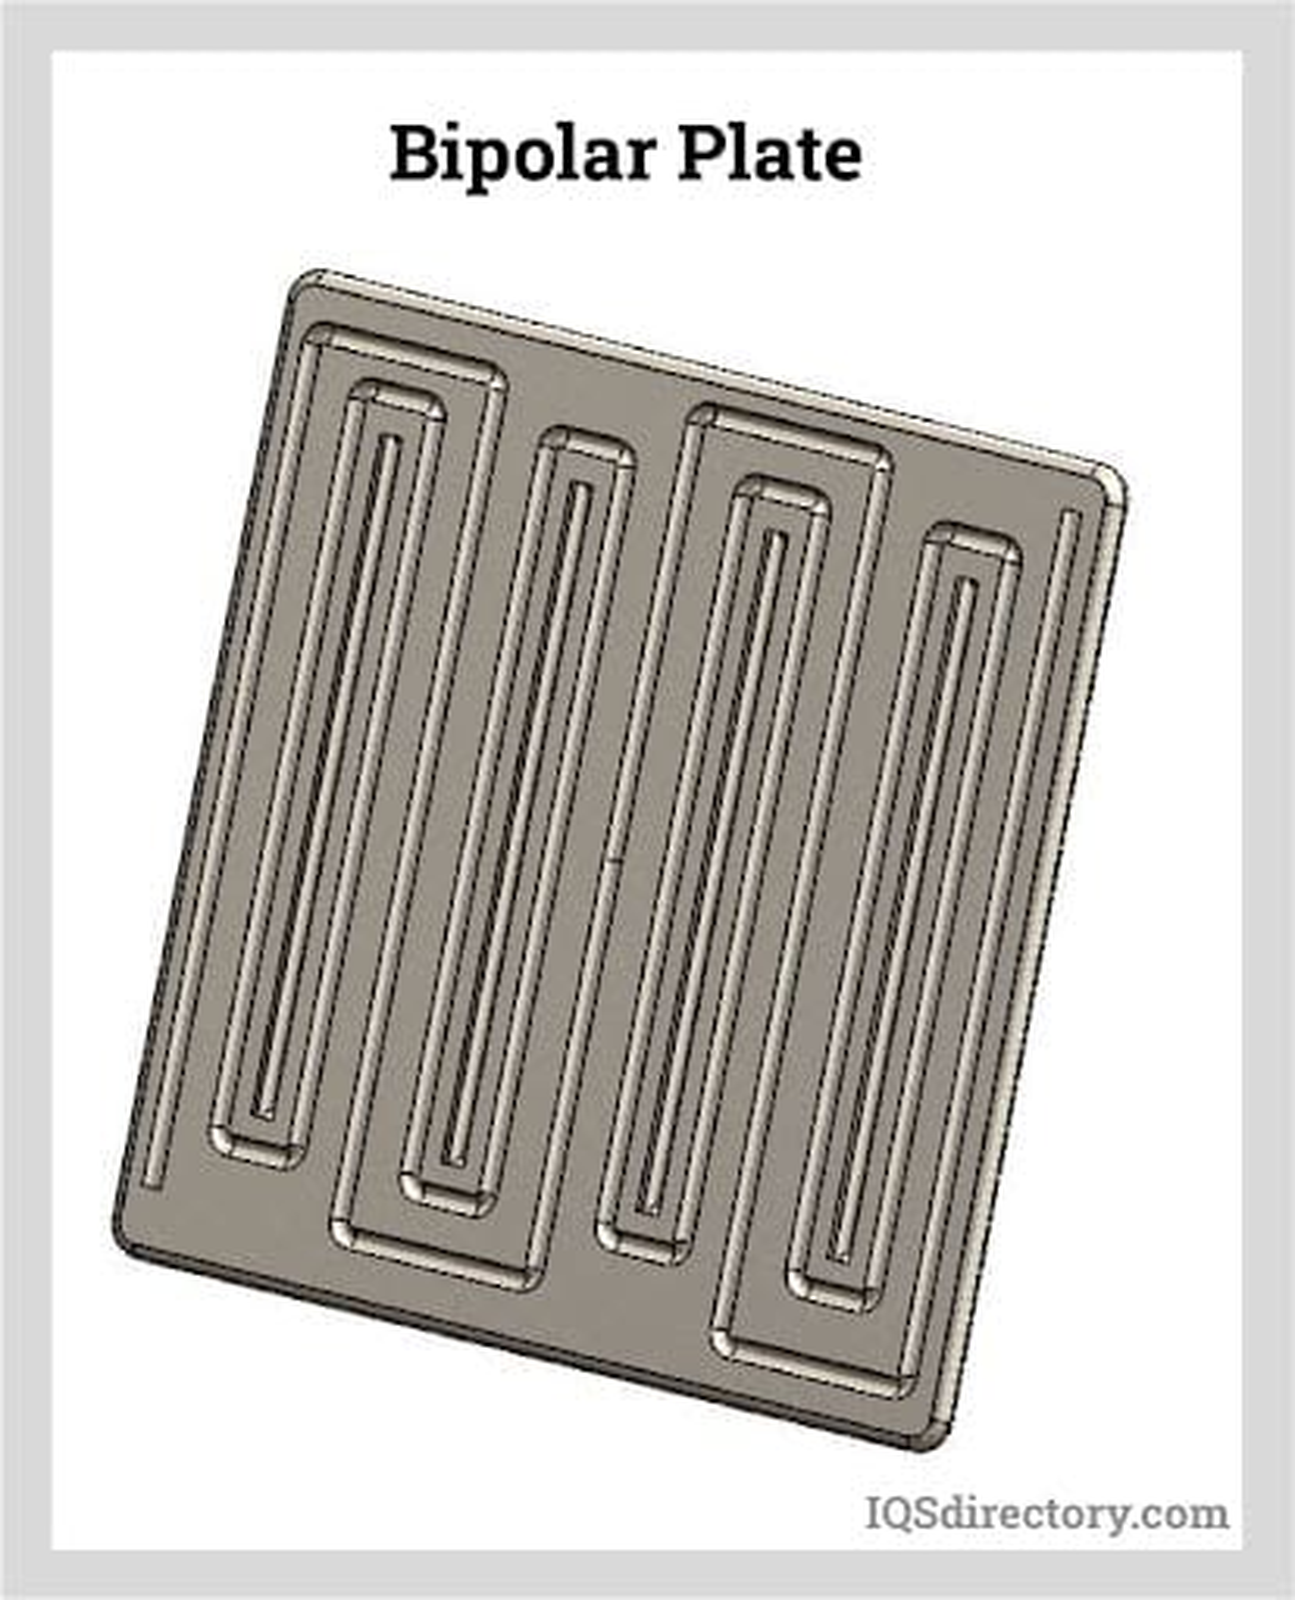 Bipolar Plate